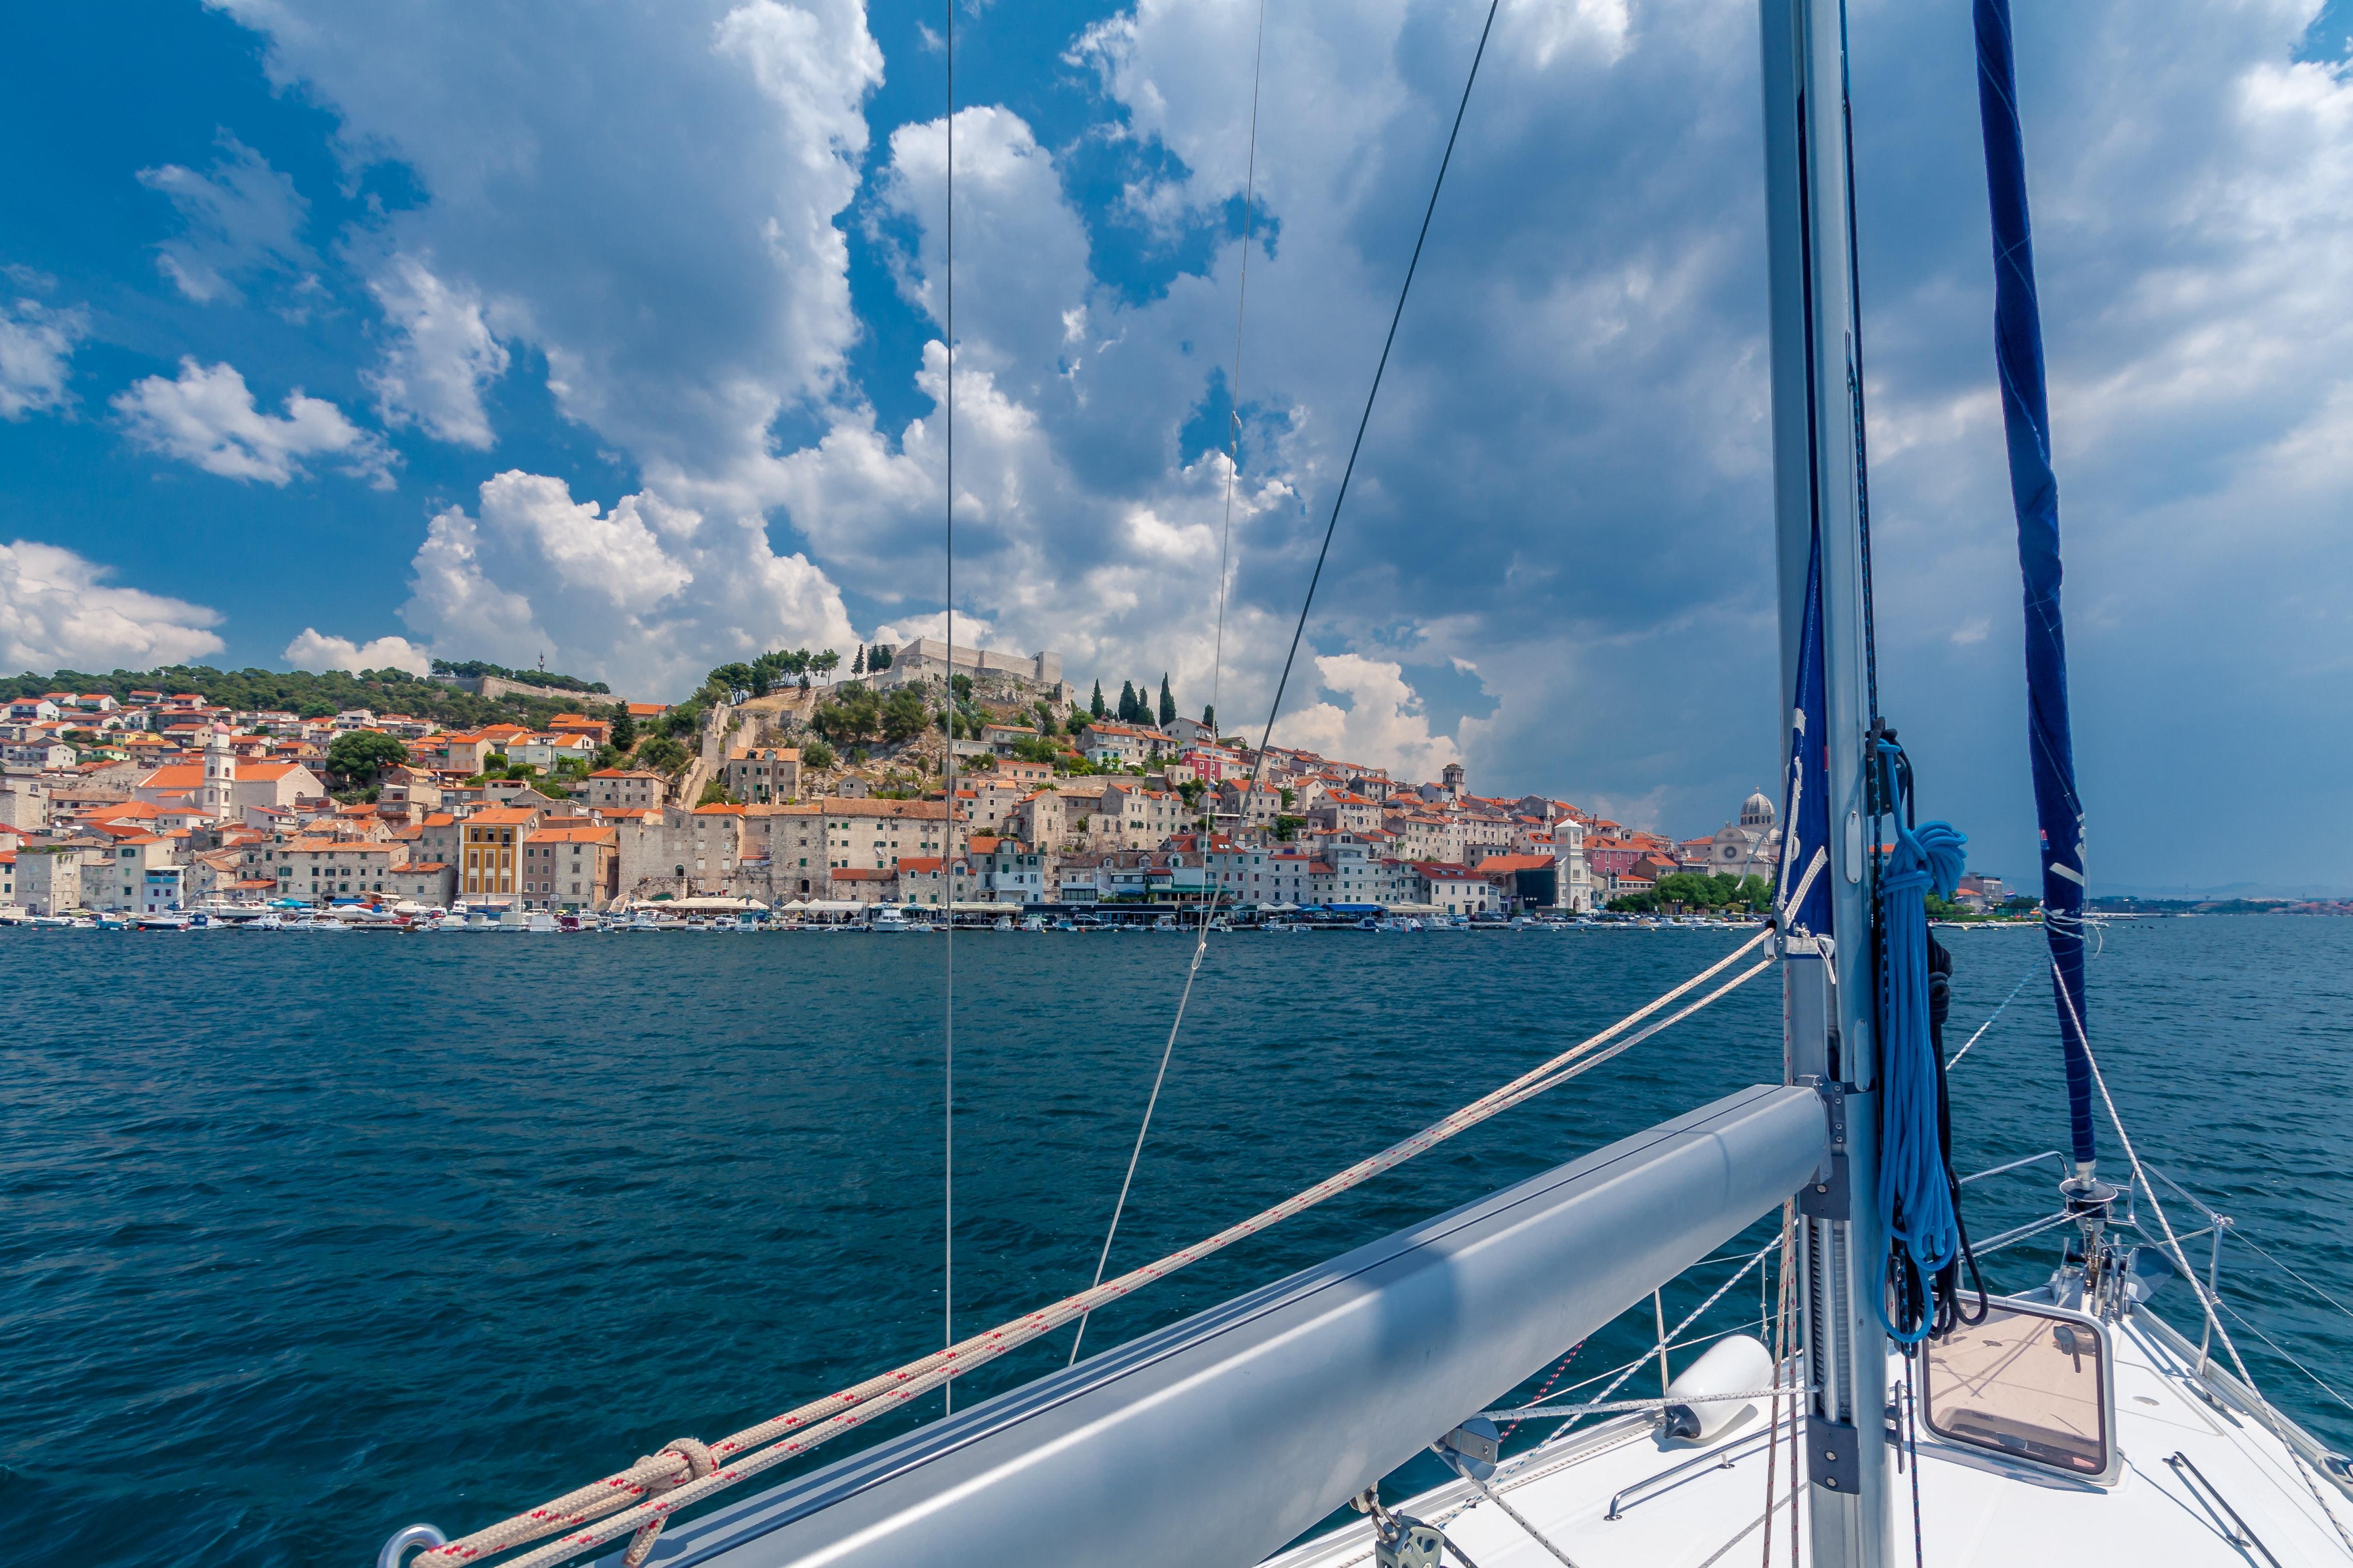 9 Best Things to do in Sibenik, Croatia